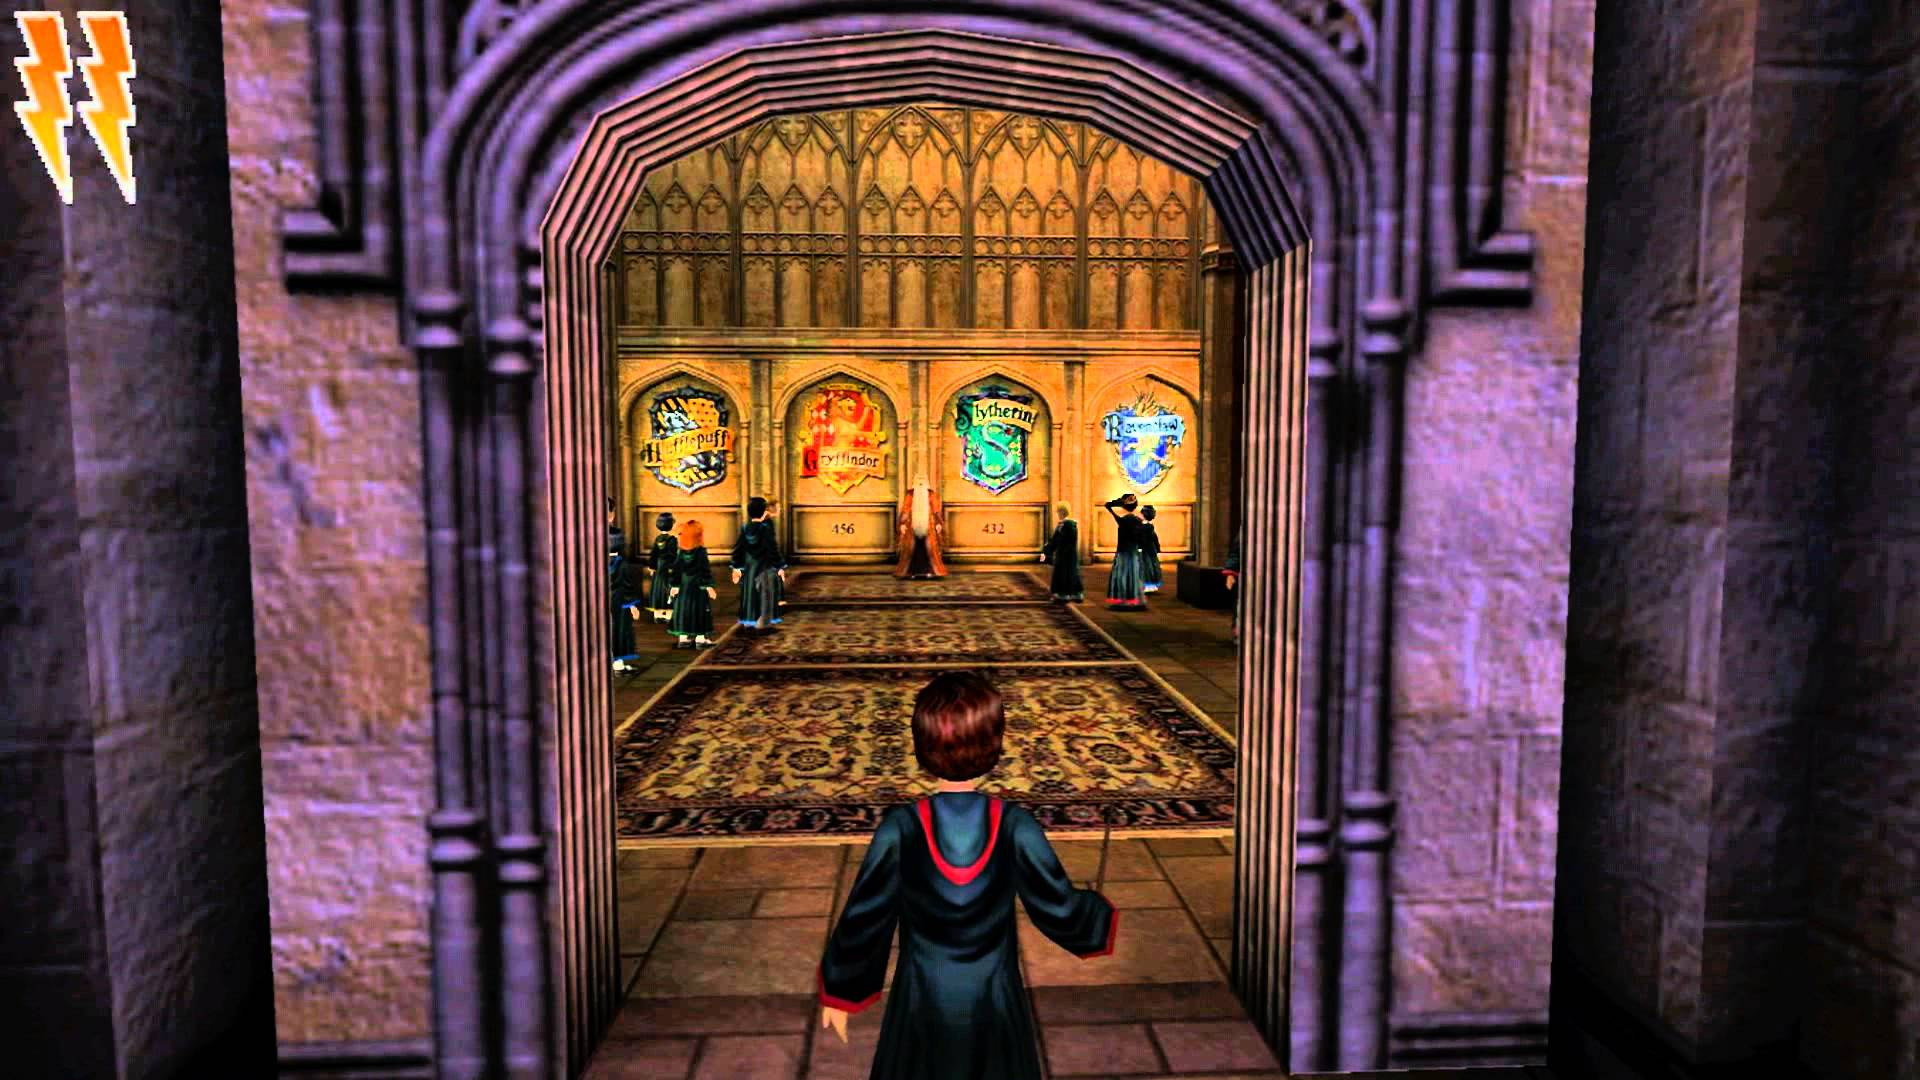 Гарри поттер и тайная комната картинки из игры